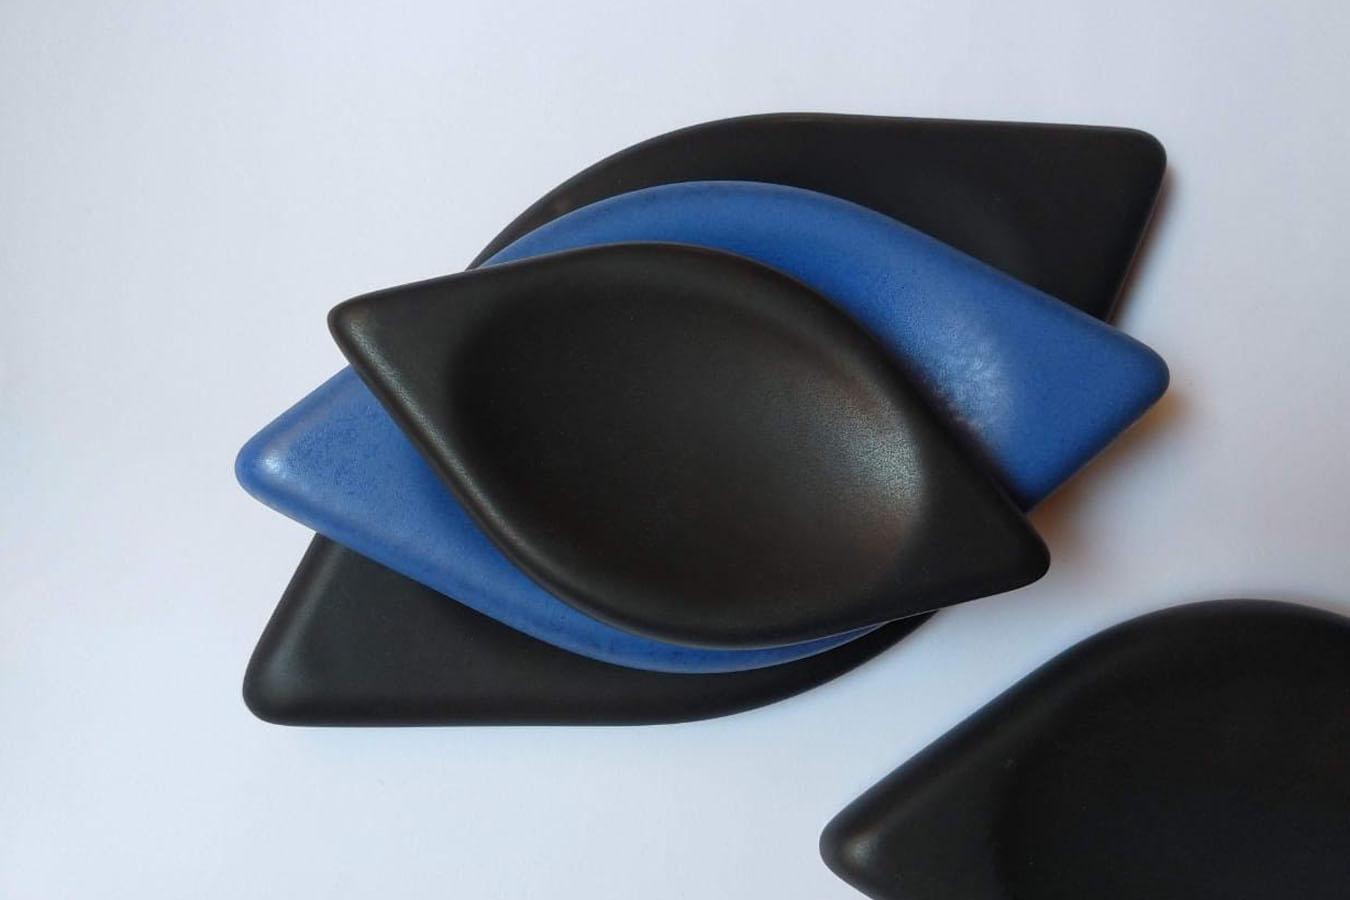 tlacoyos de maiz azul arte contemporaneo andres lhima tlacoyos botaneros